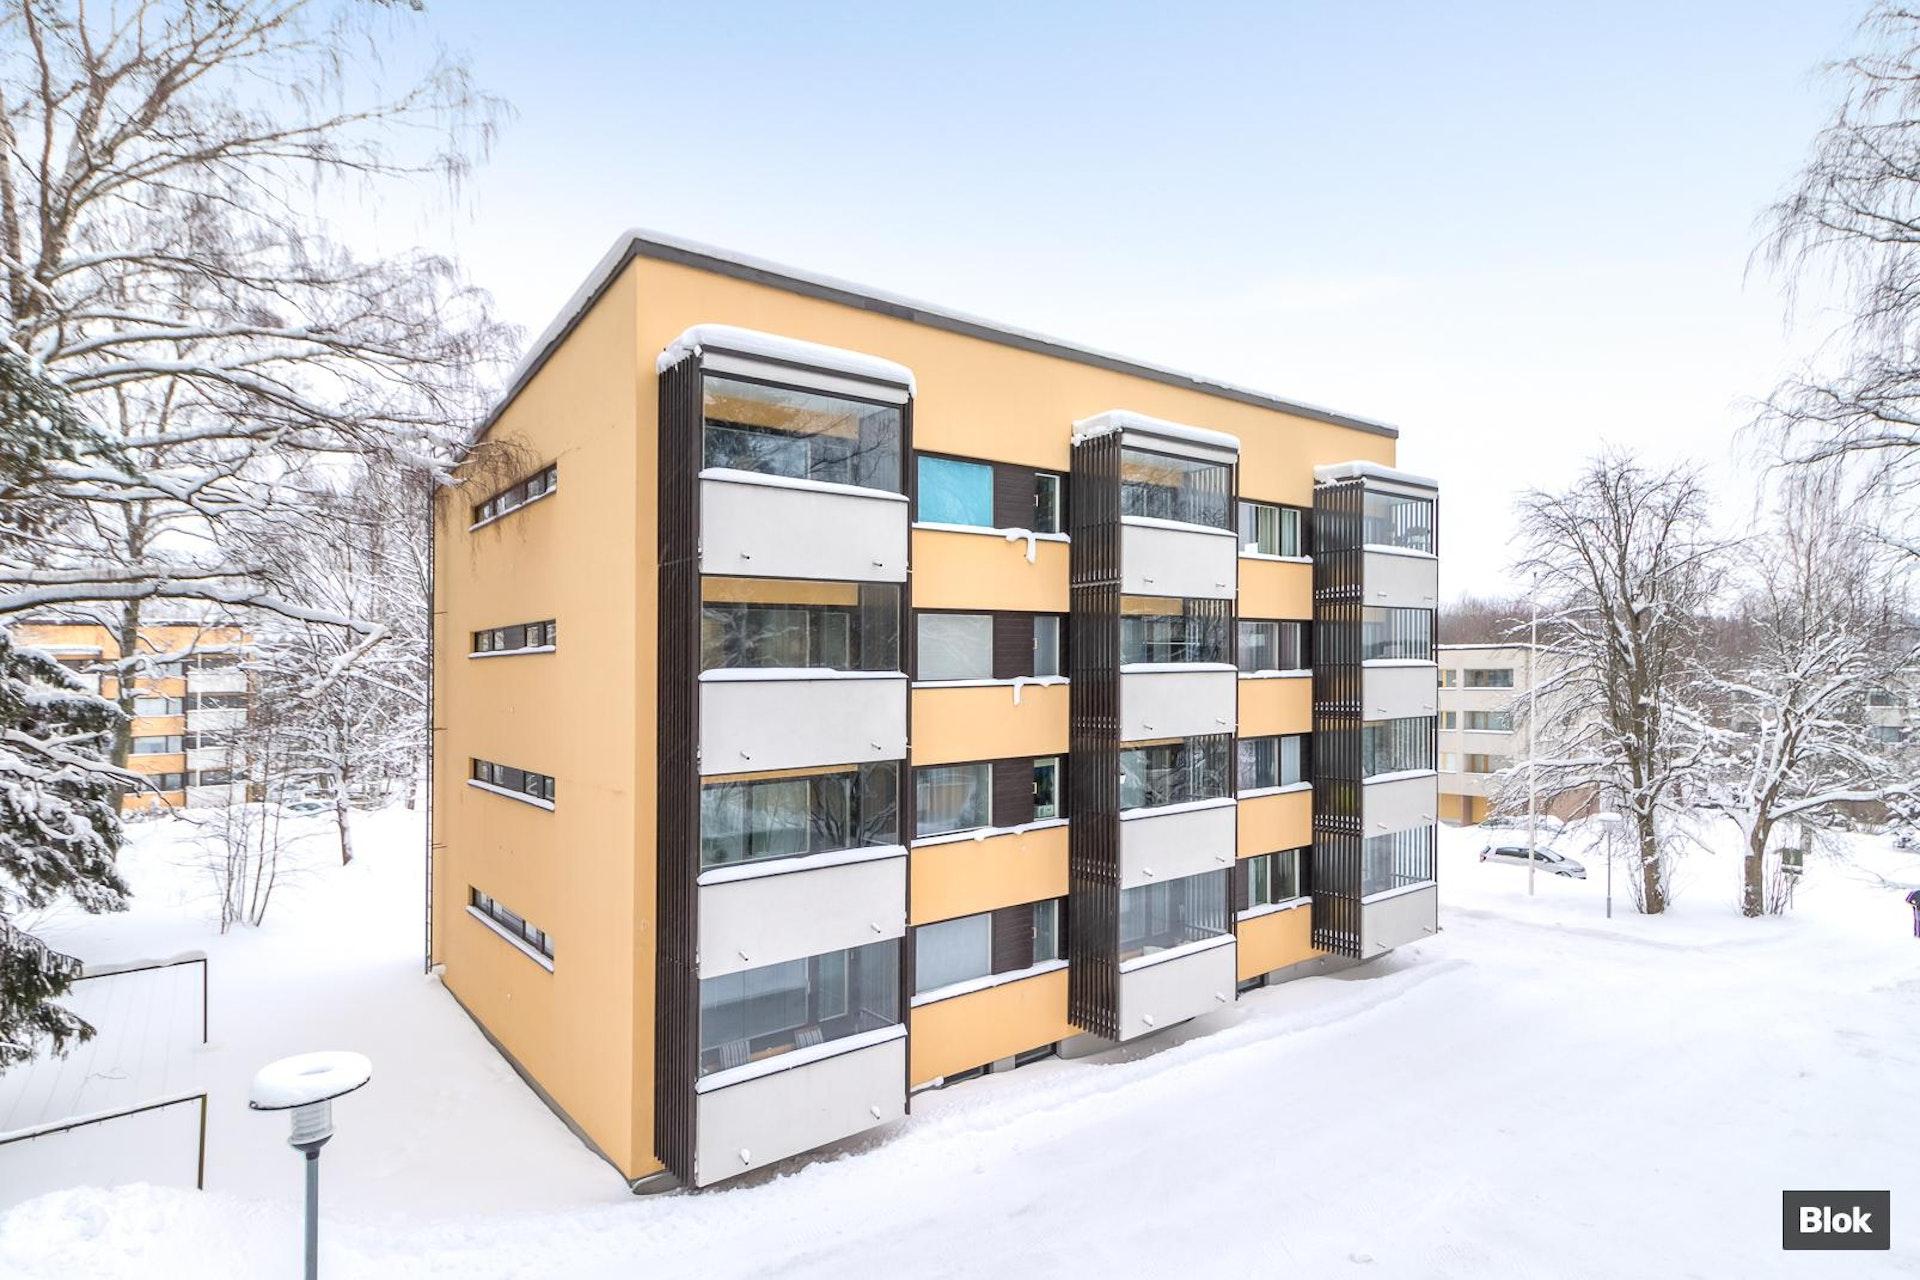 Putkiremontoitu kaksio Helsingin Konalassa